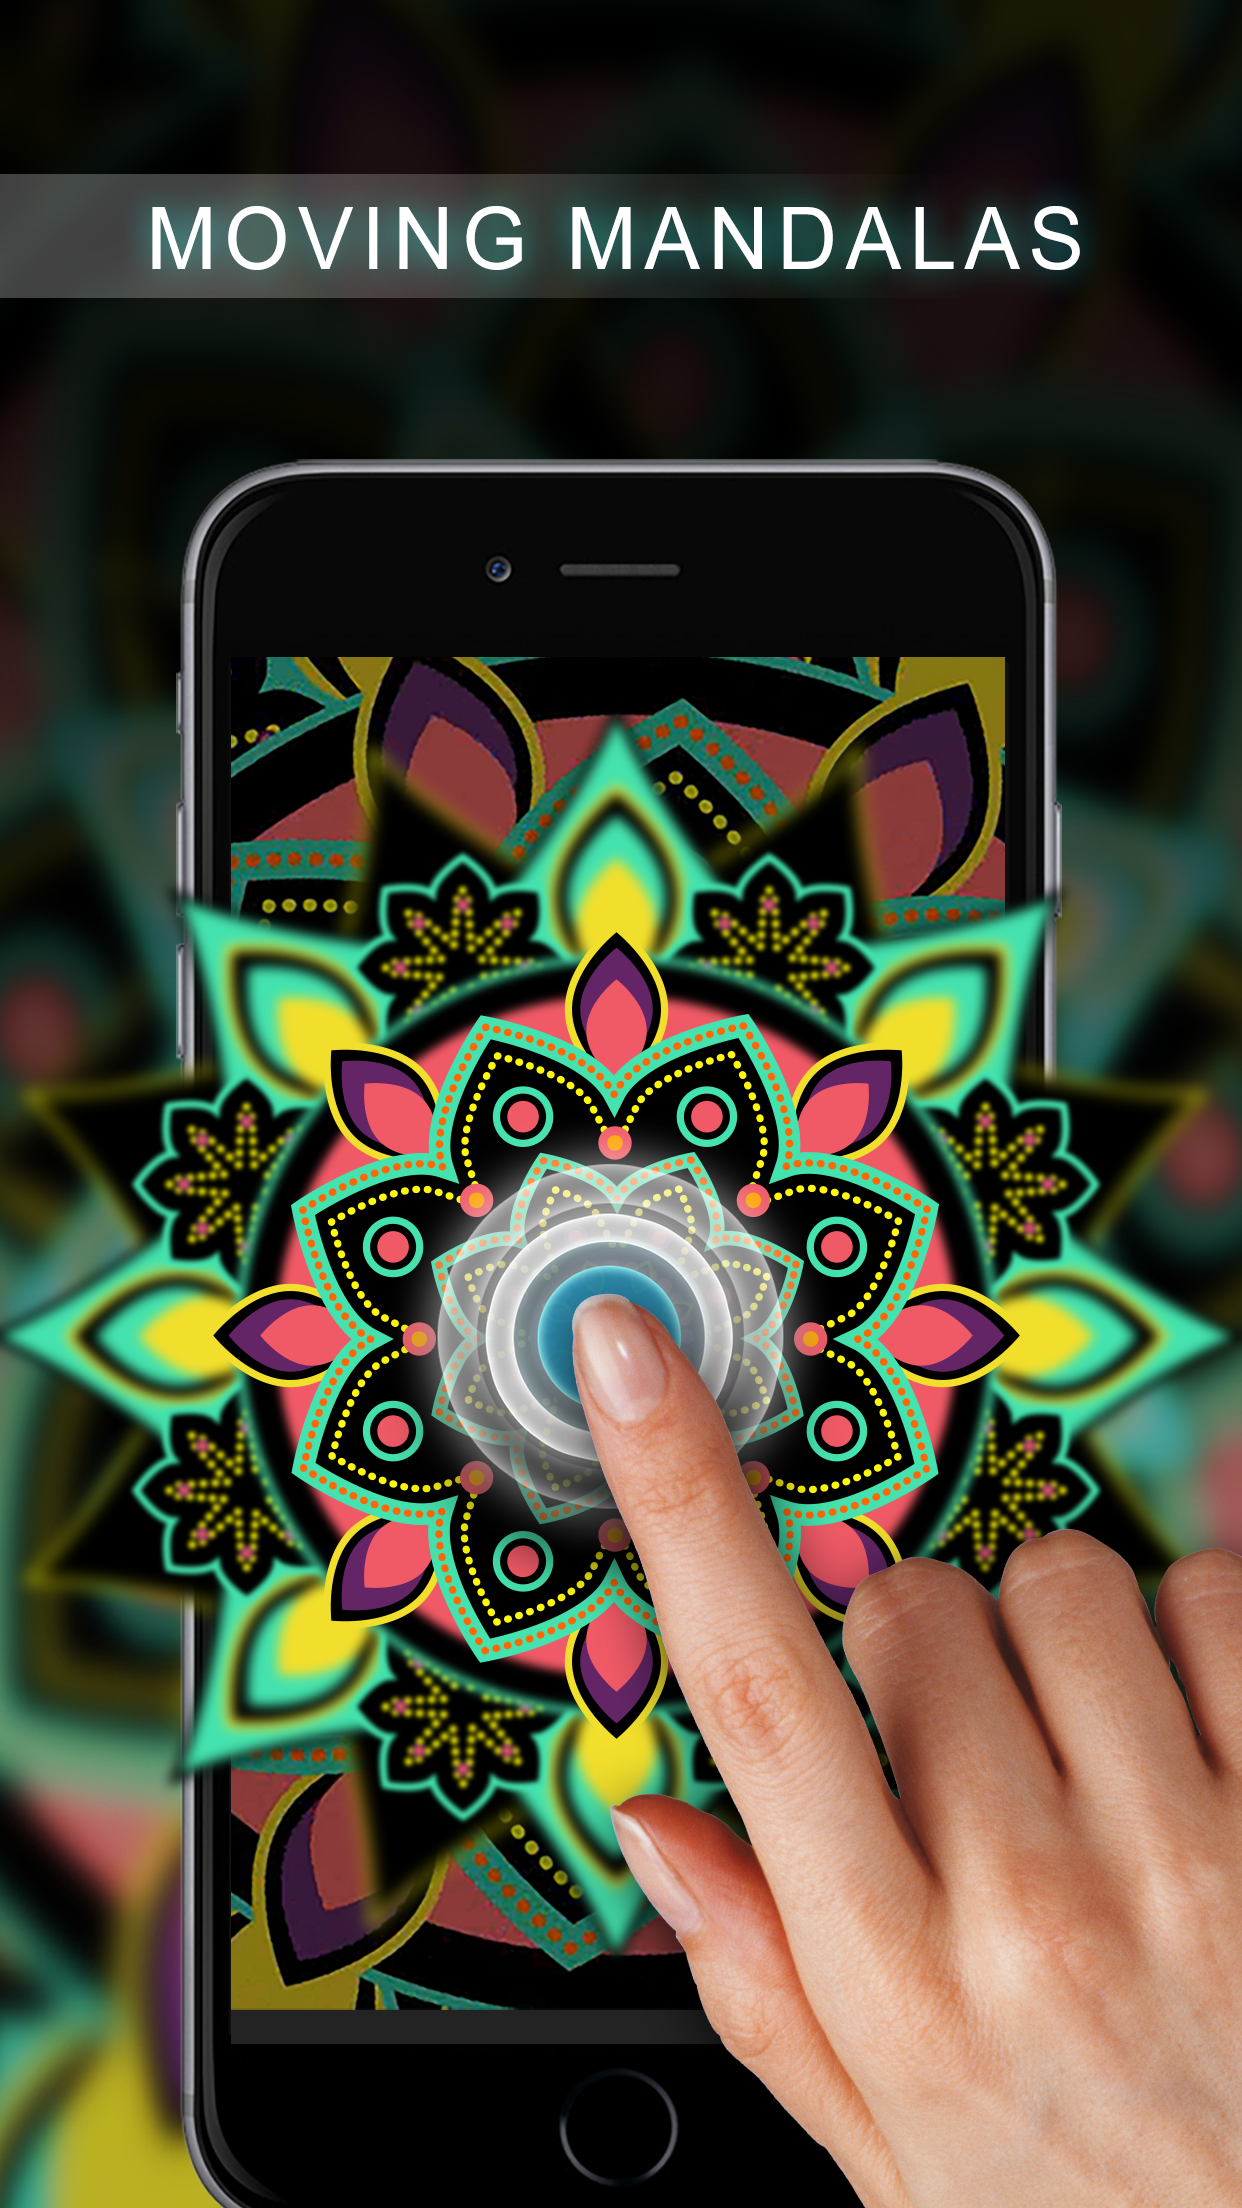 Live Mandala Wallpapers for iOS https://itunes.apple.com/us